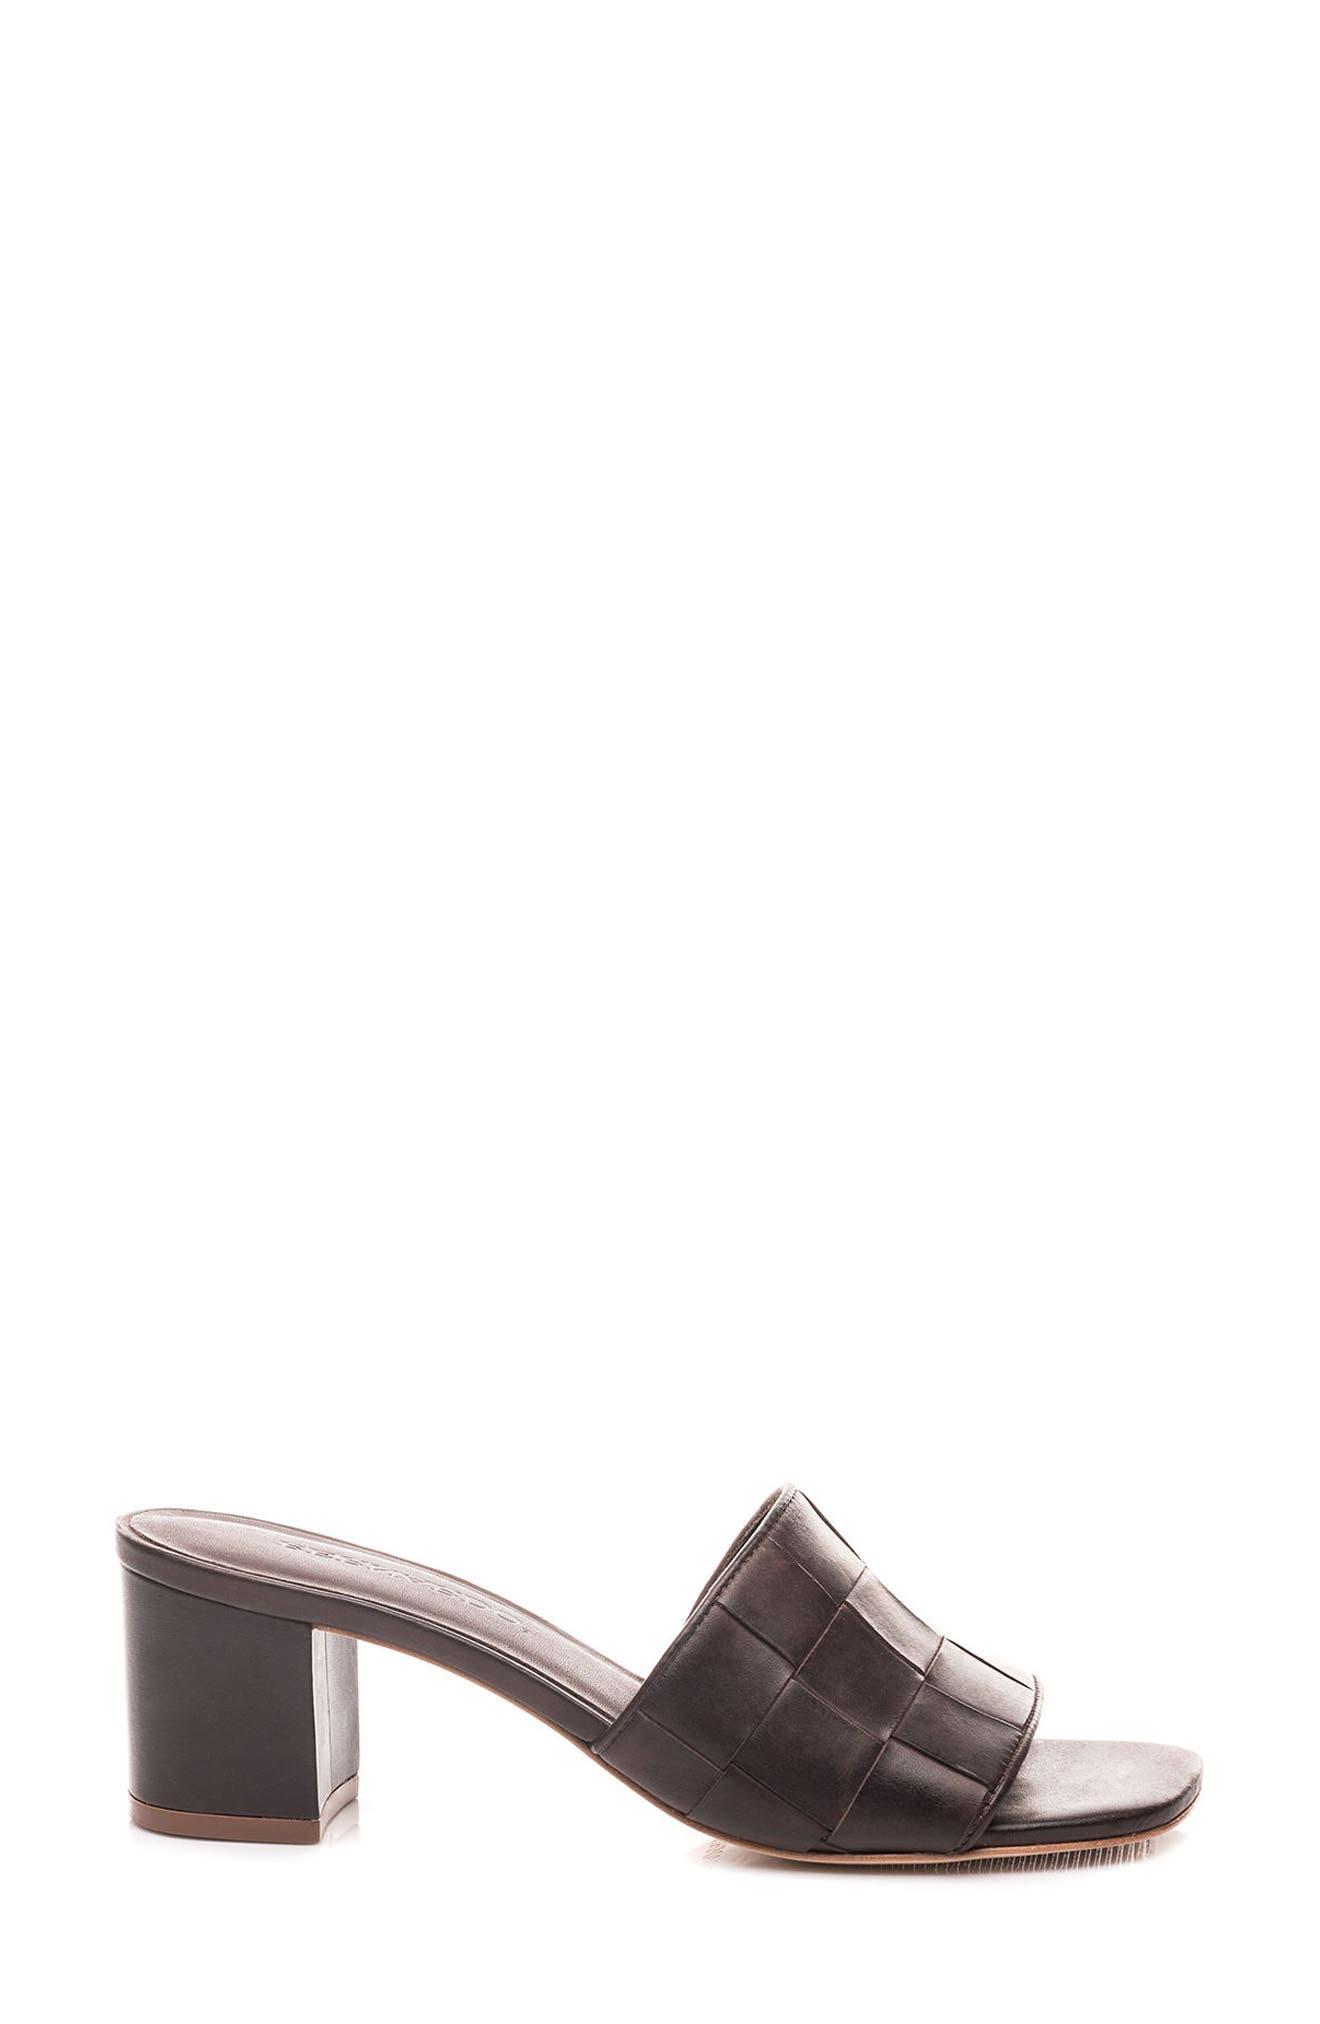 Bernardo Bridget Block Heel Sandal,                             Alternate thumbnail 11, color,